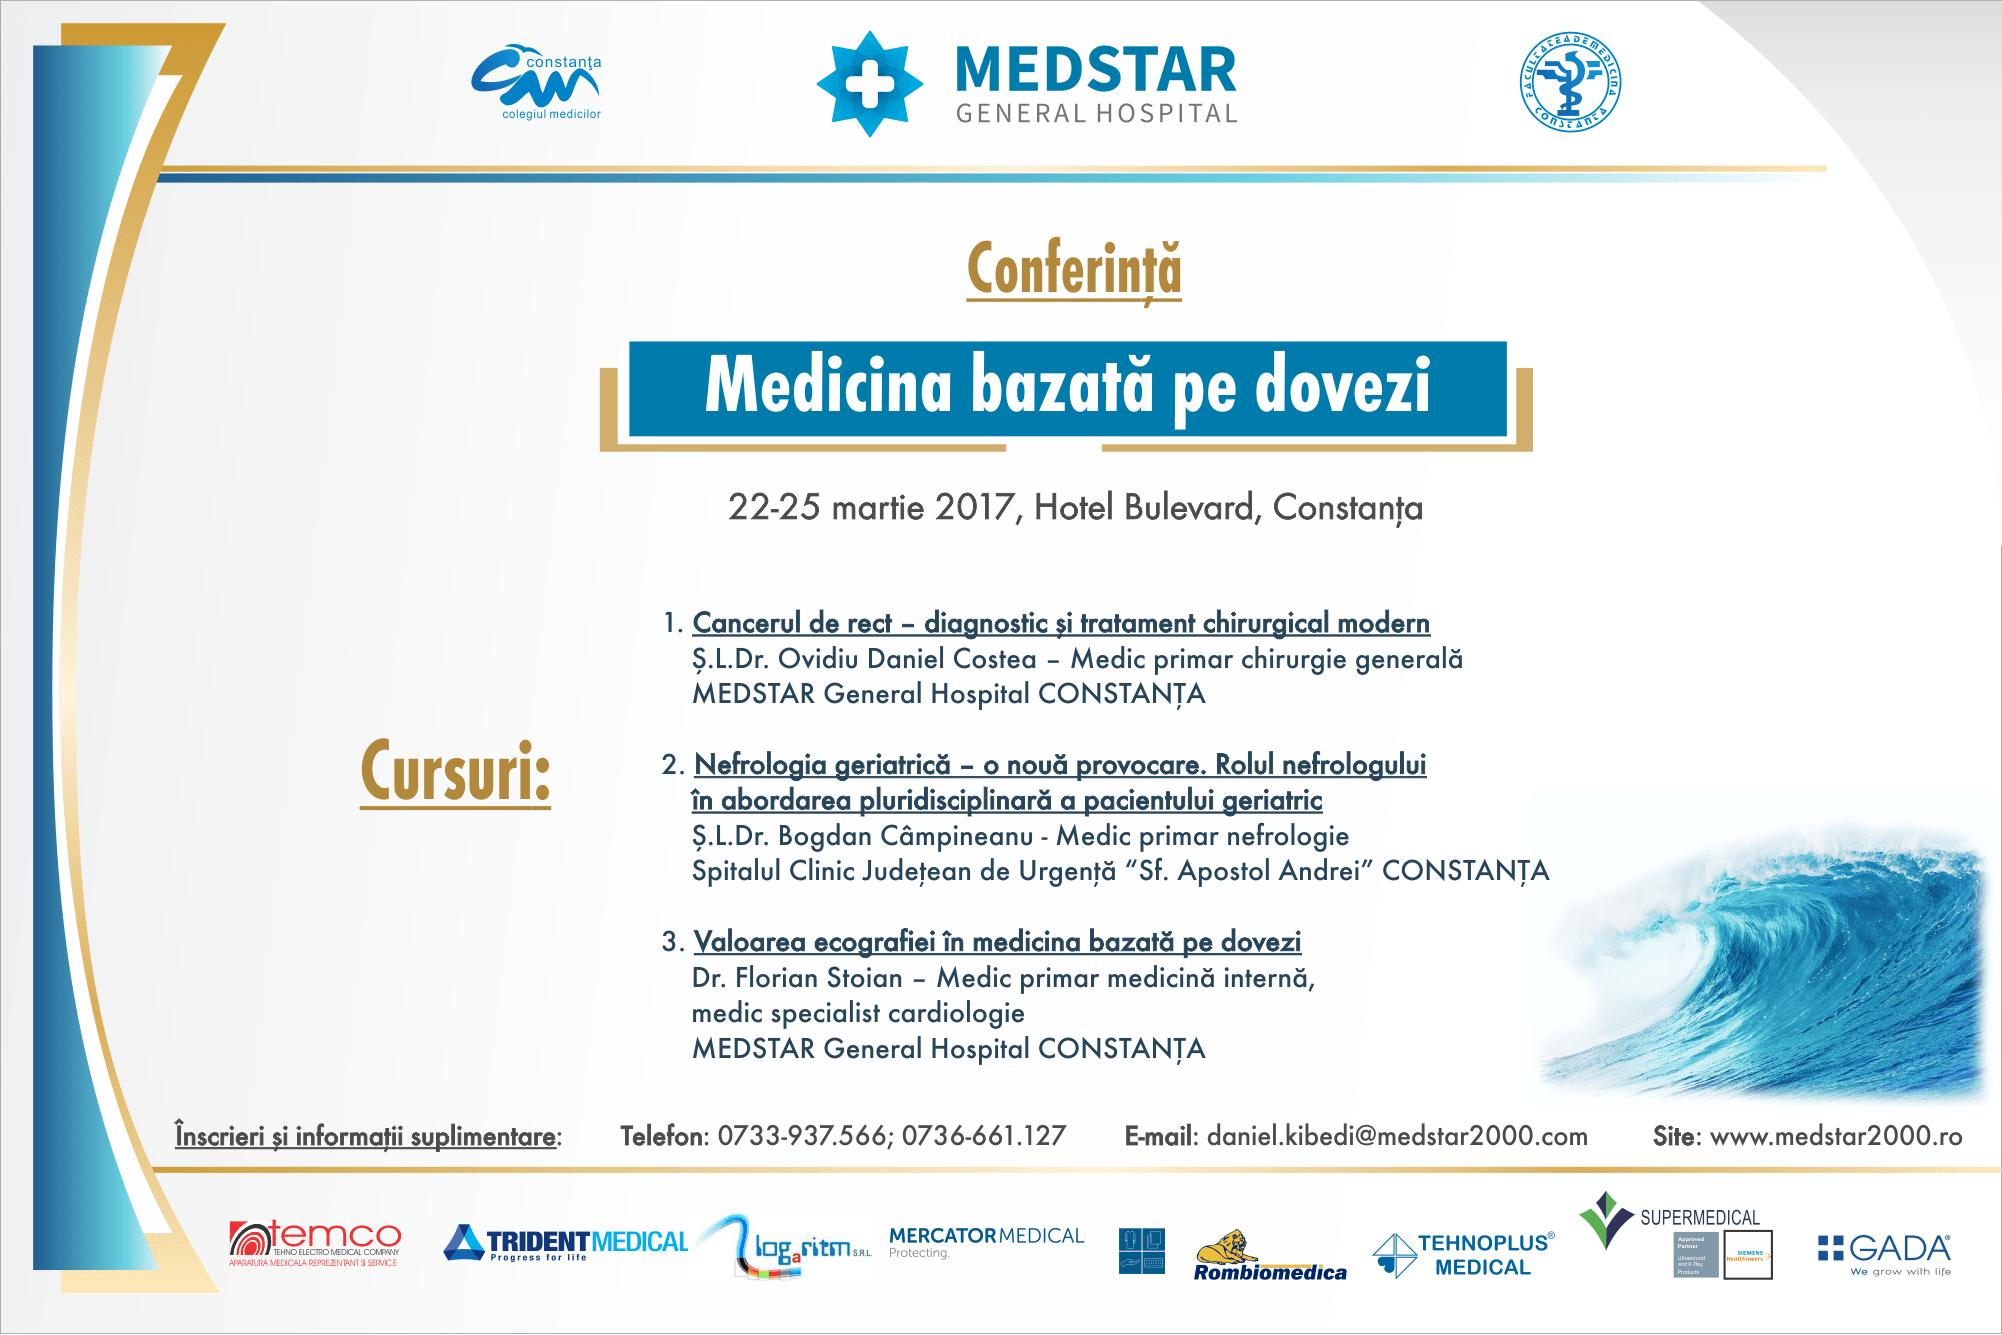 http://www.medstar2000.ro/wp-content/uploads/2015/11/Medicina-bazata-pe-dovezi.png